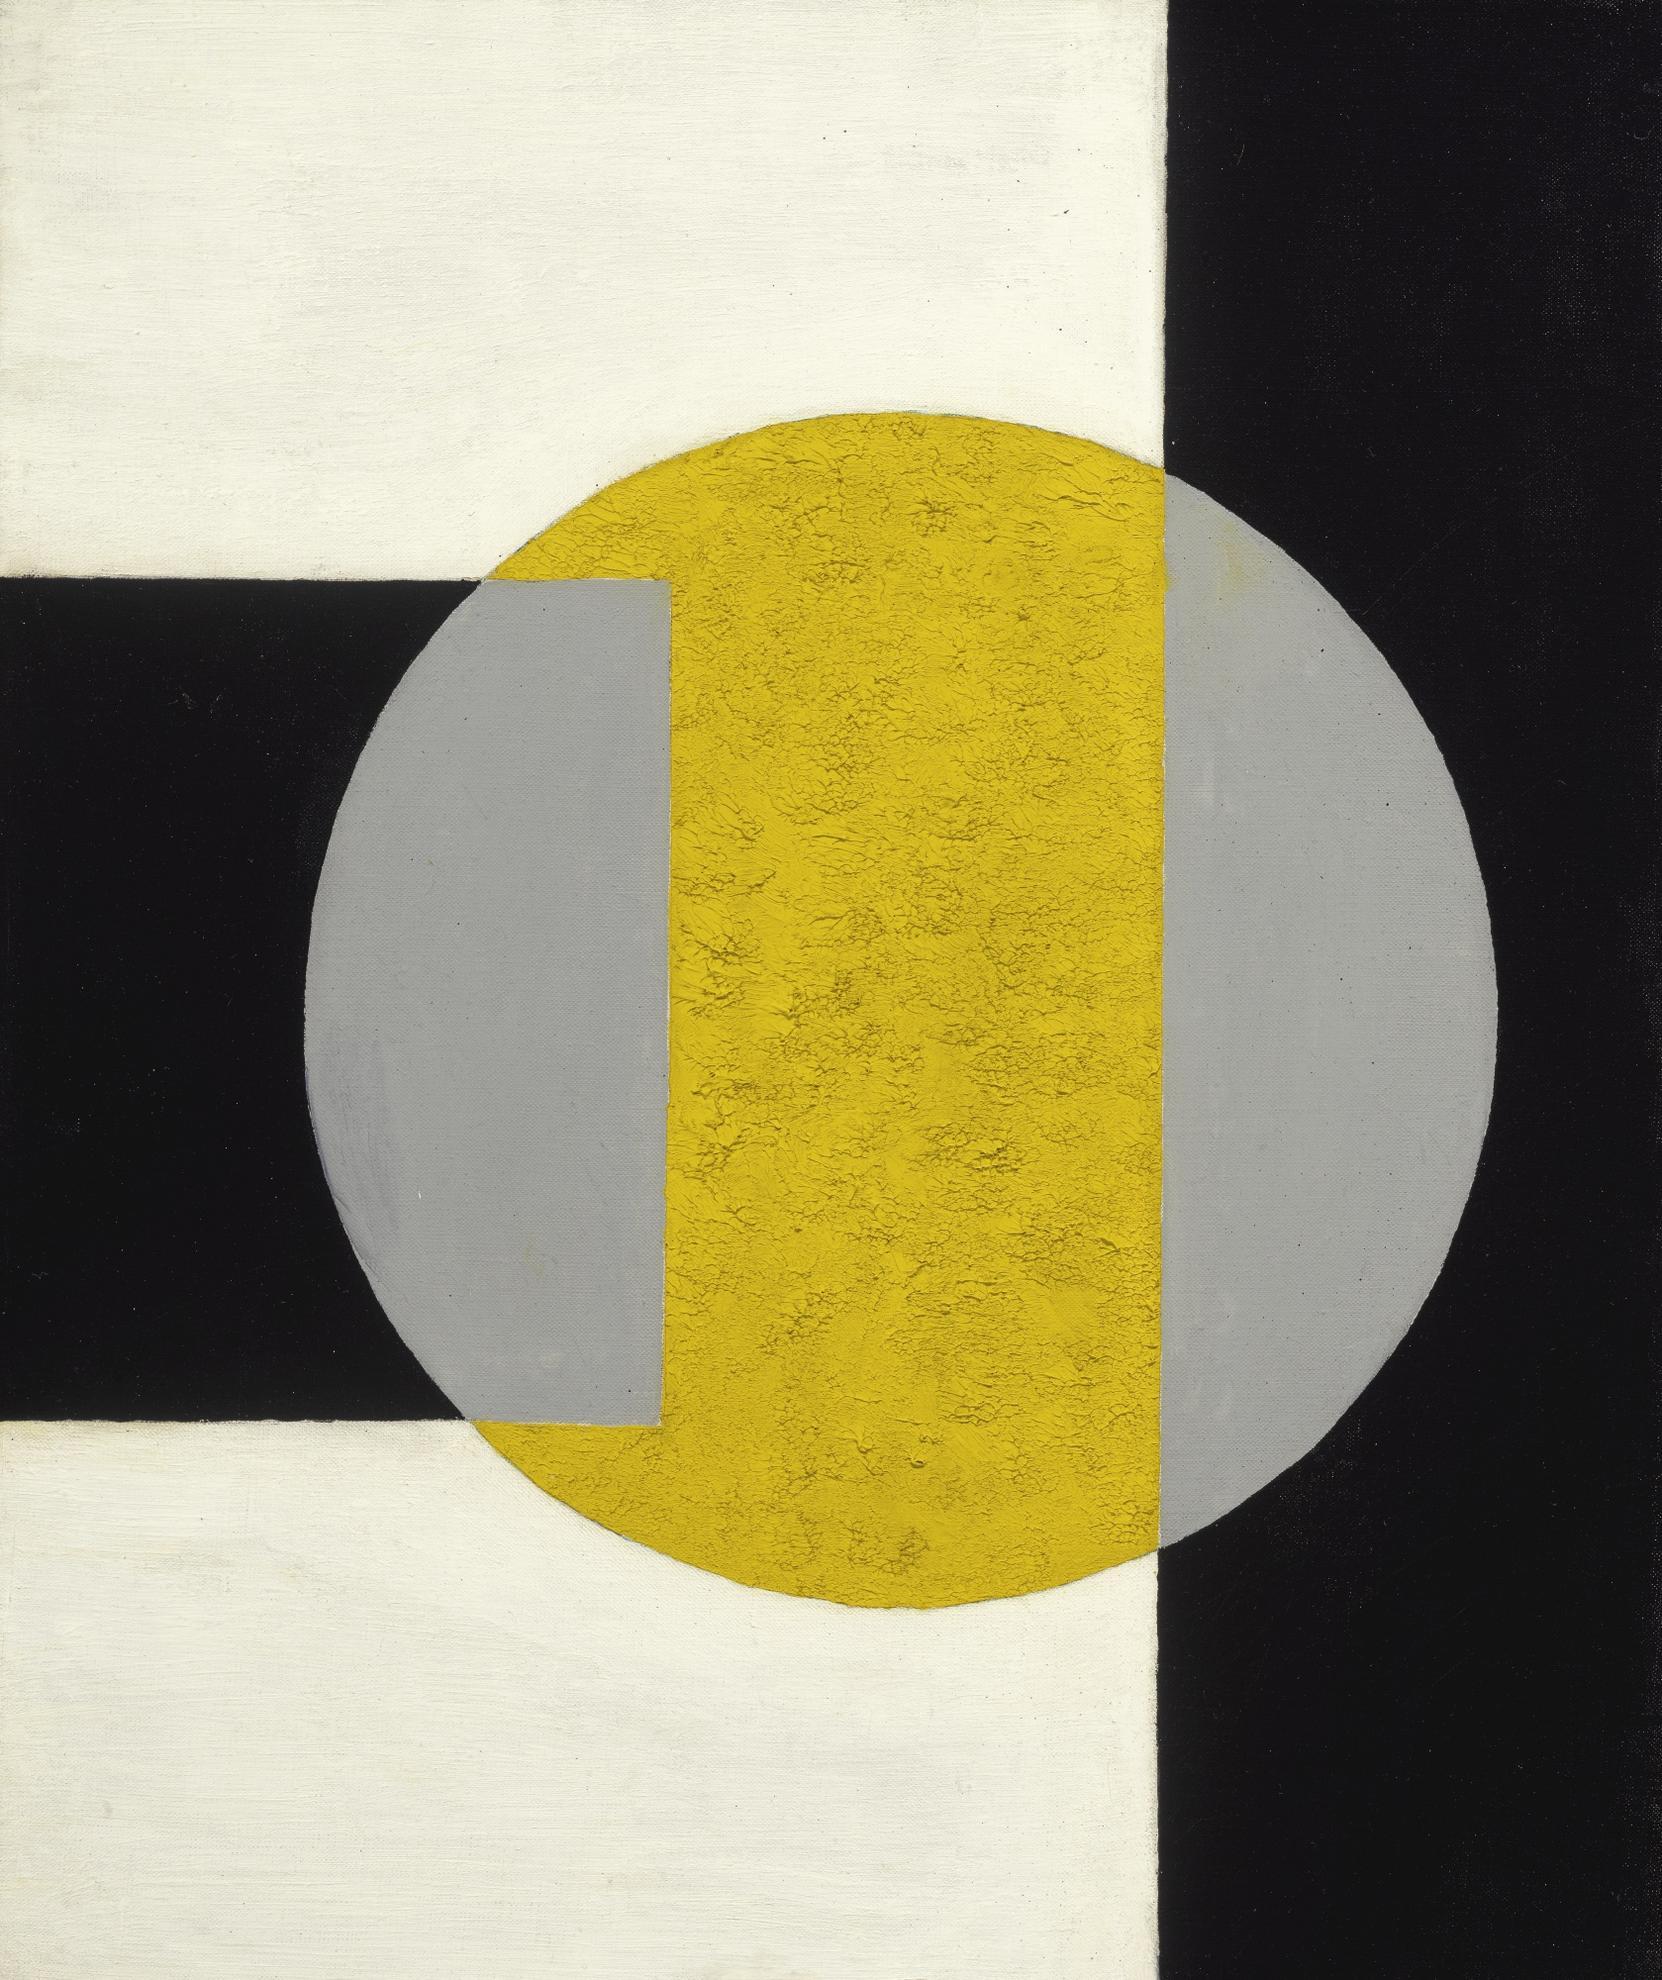 Charles Green Shaw-Bright Augury-1970